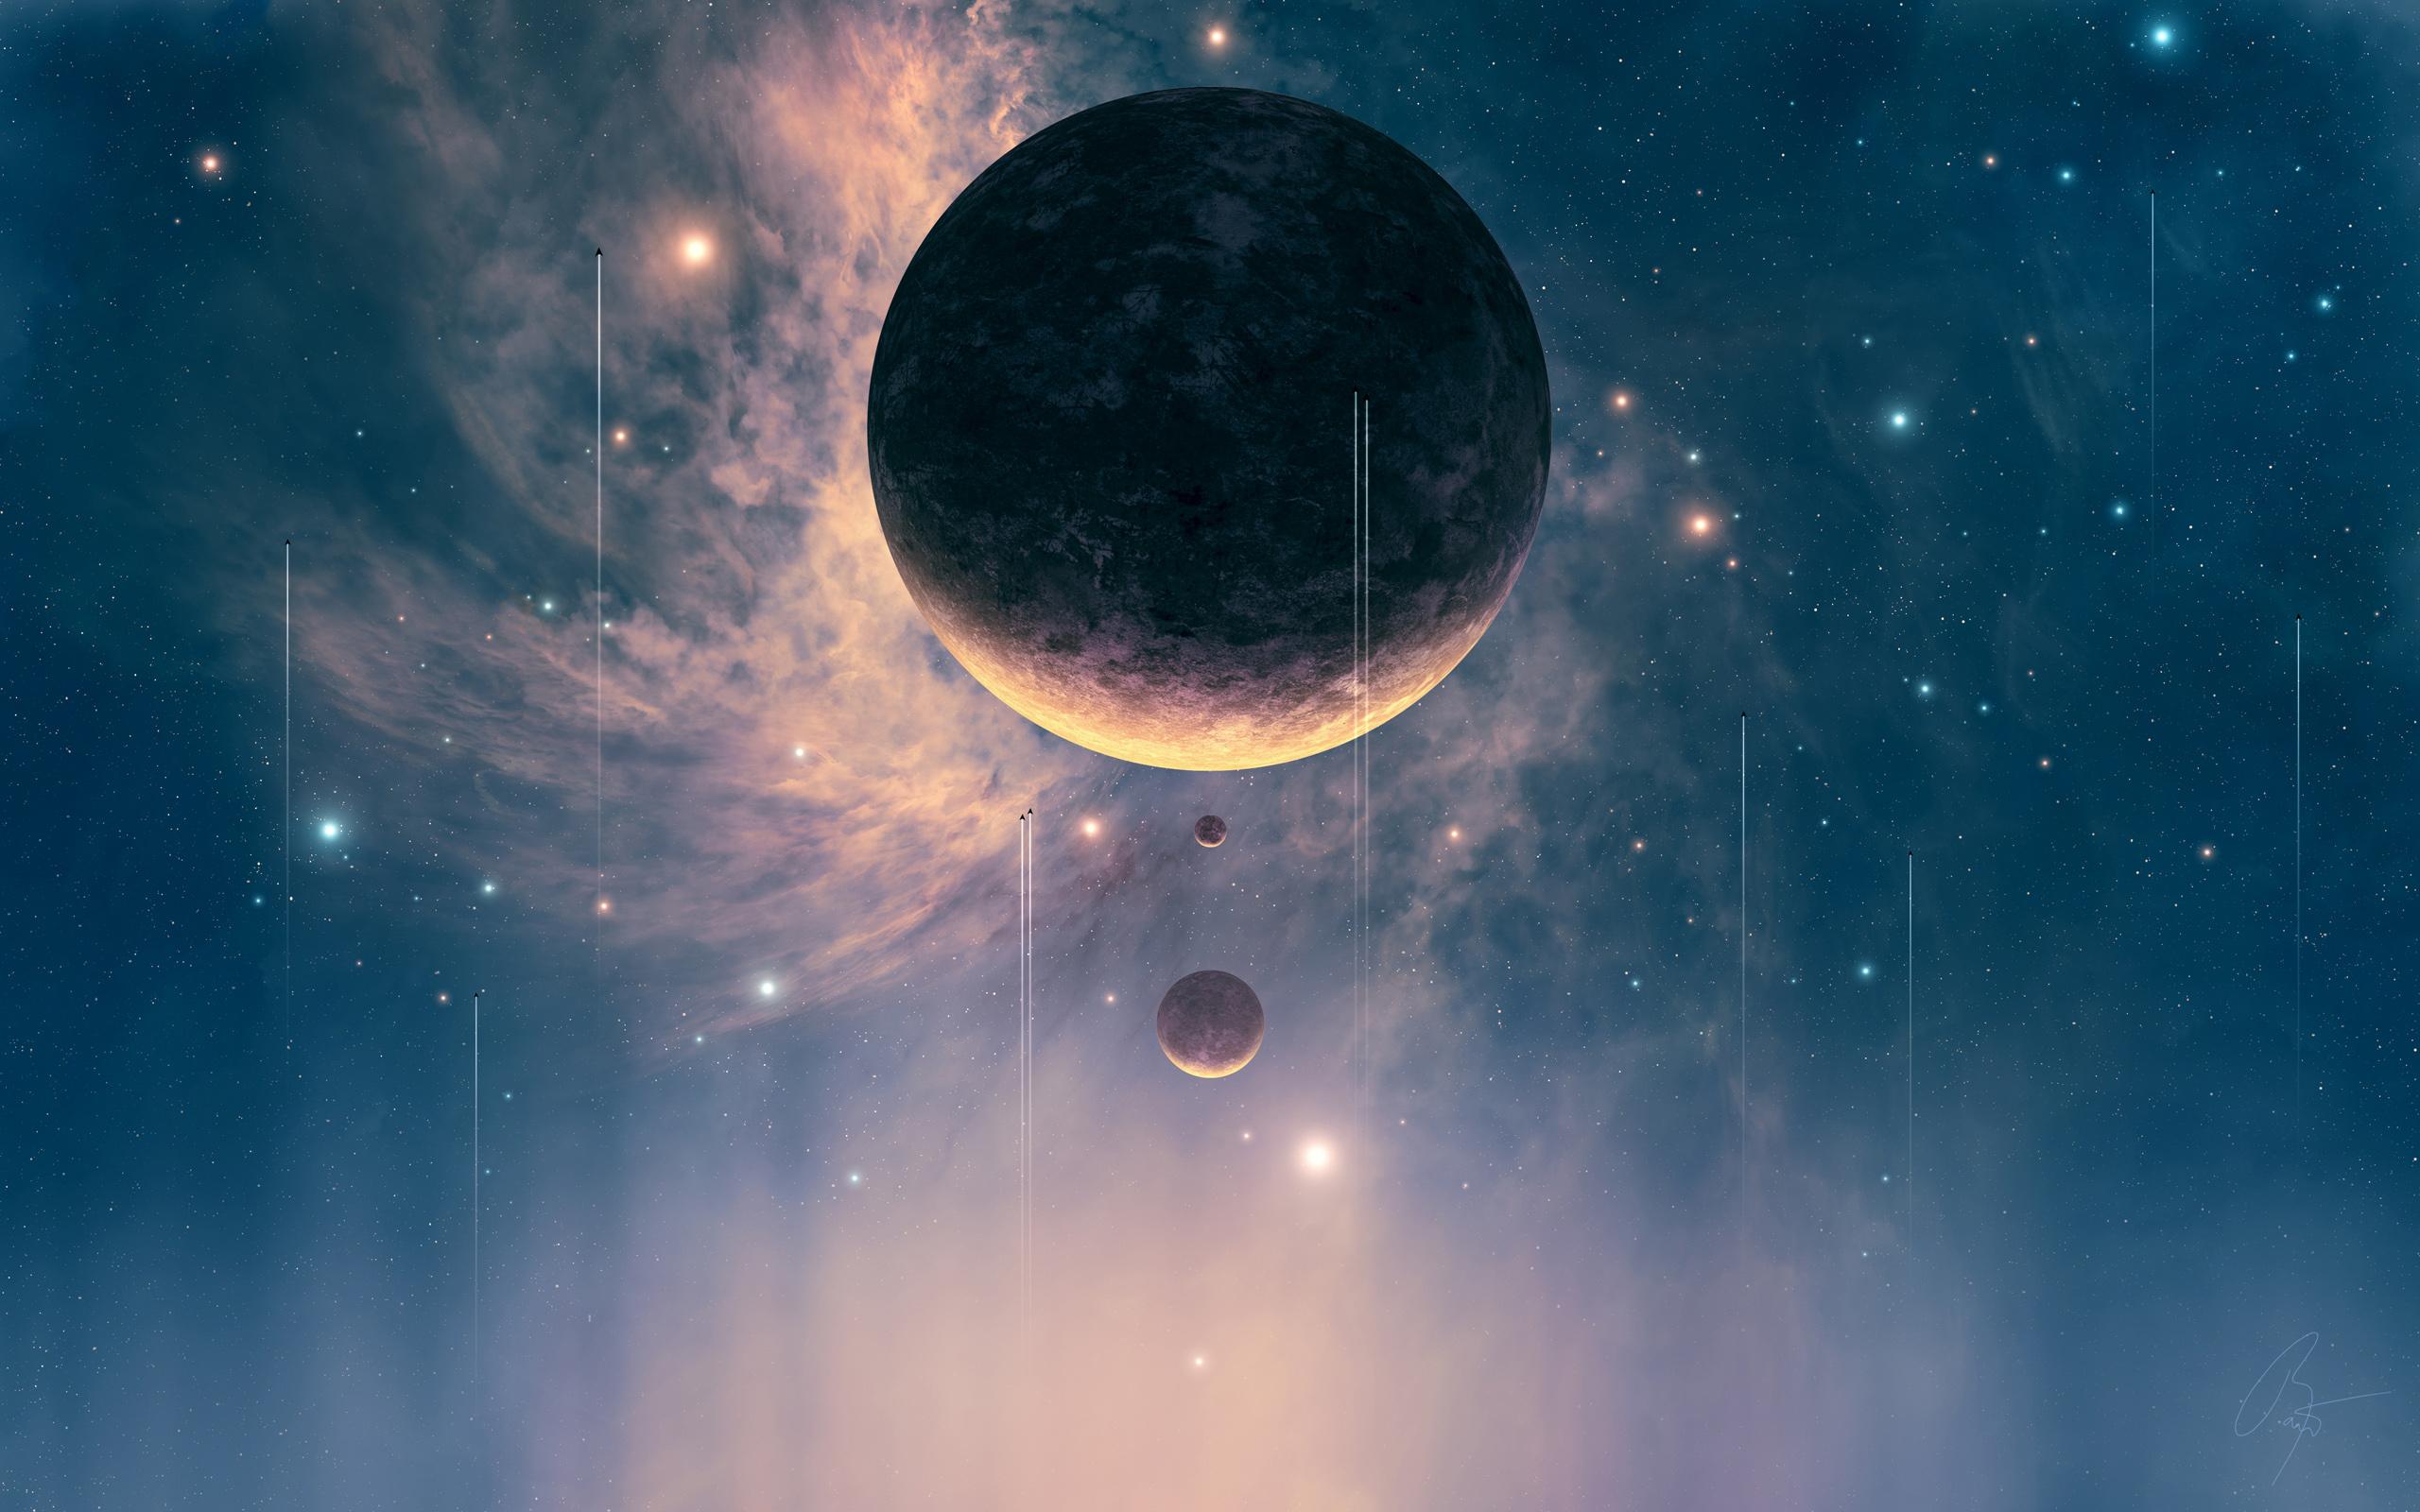 HD Wallpapers Falling Planet